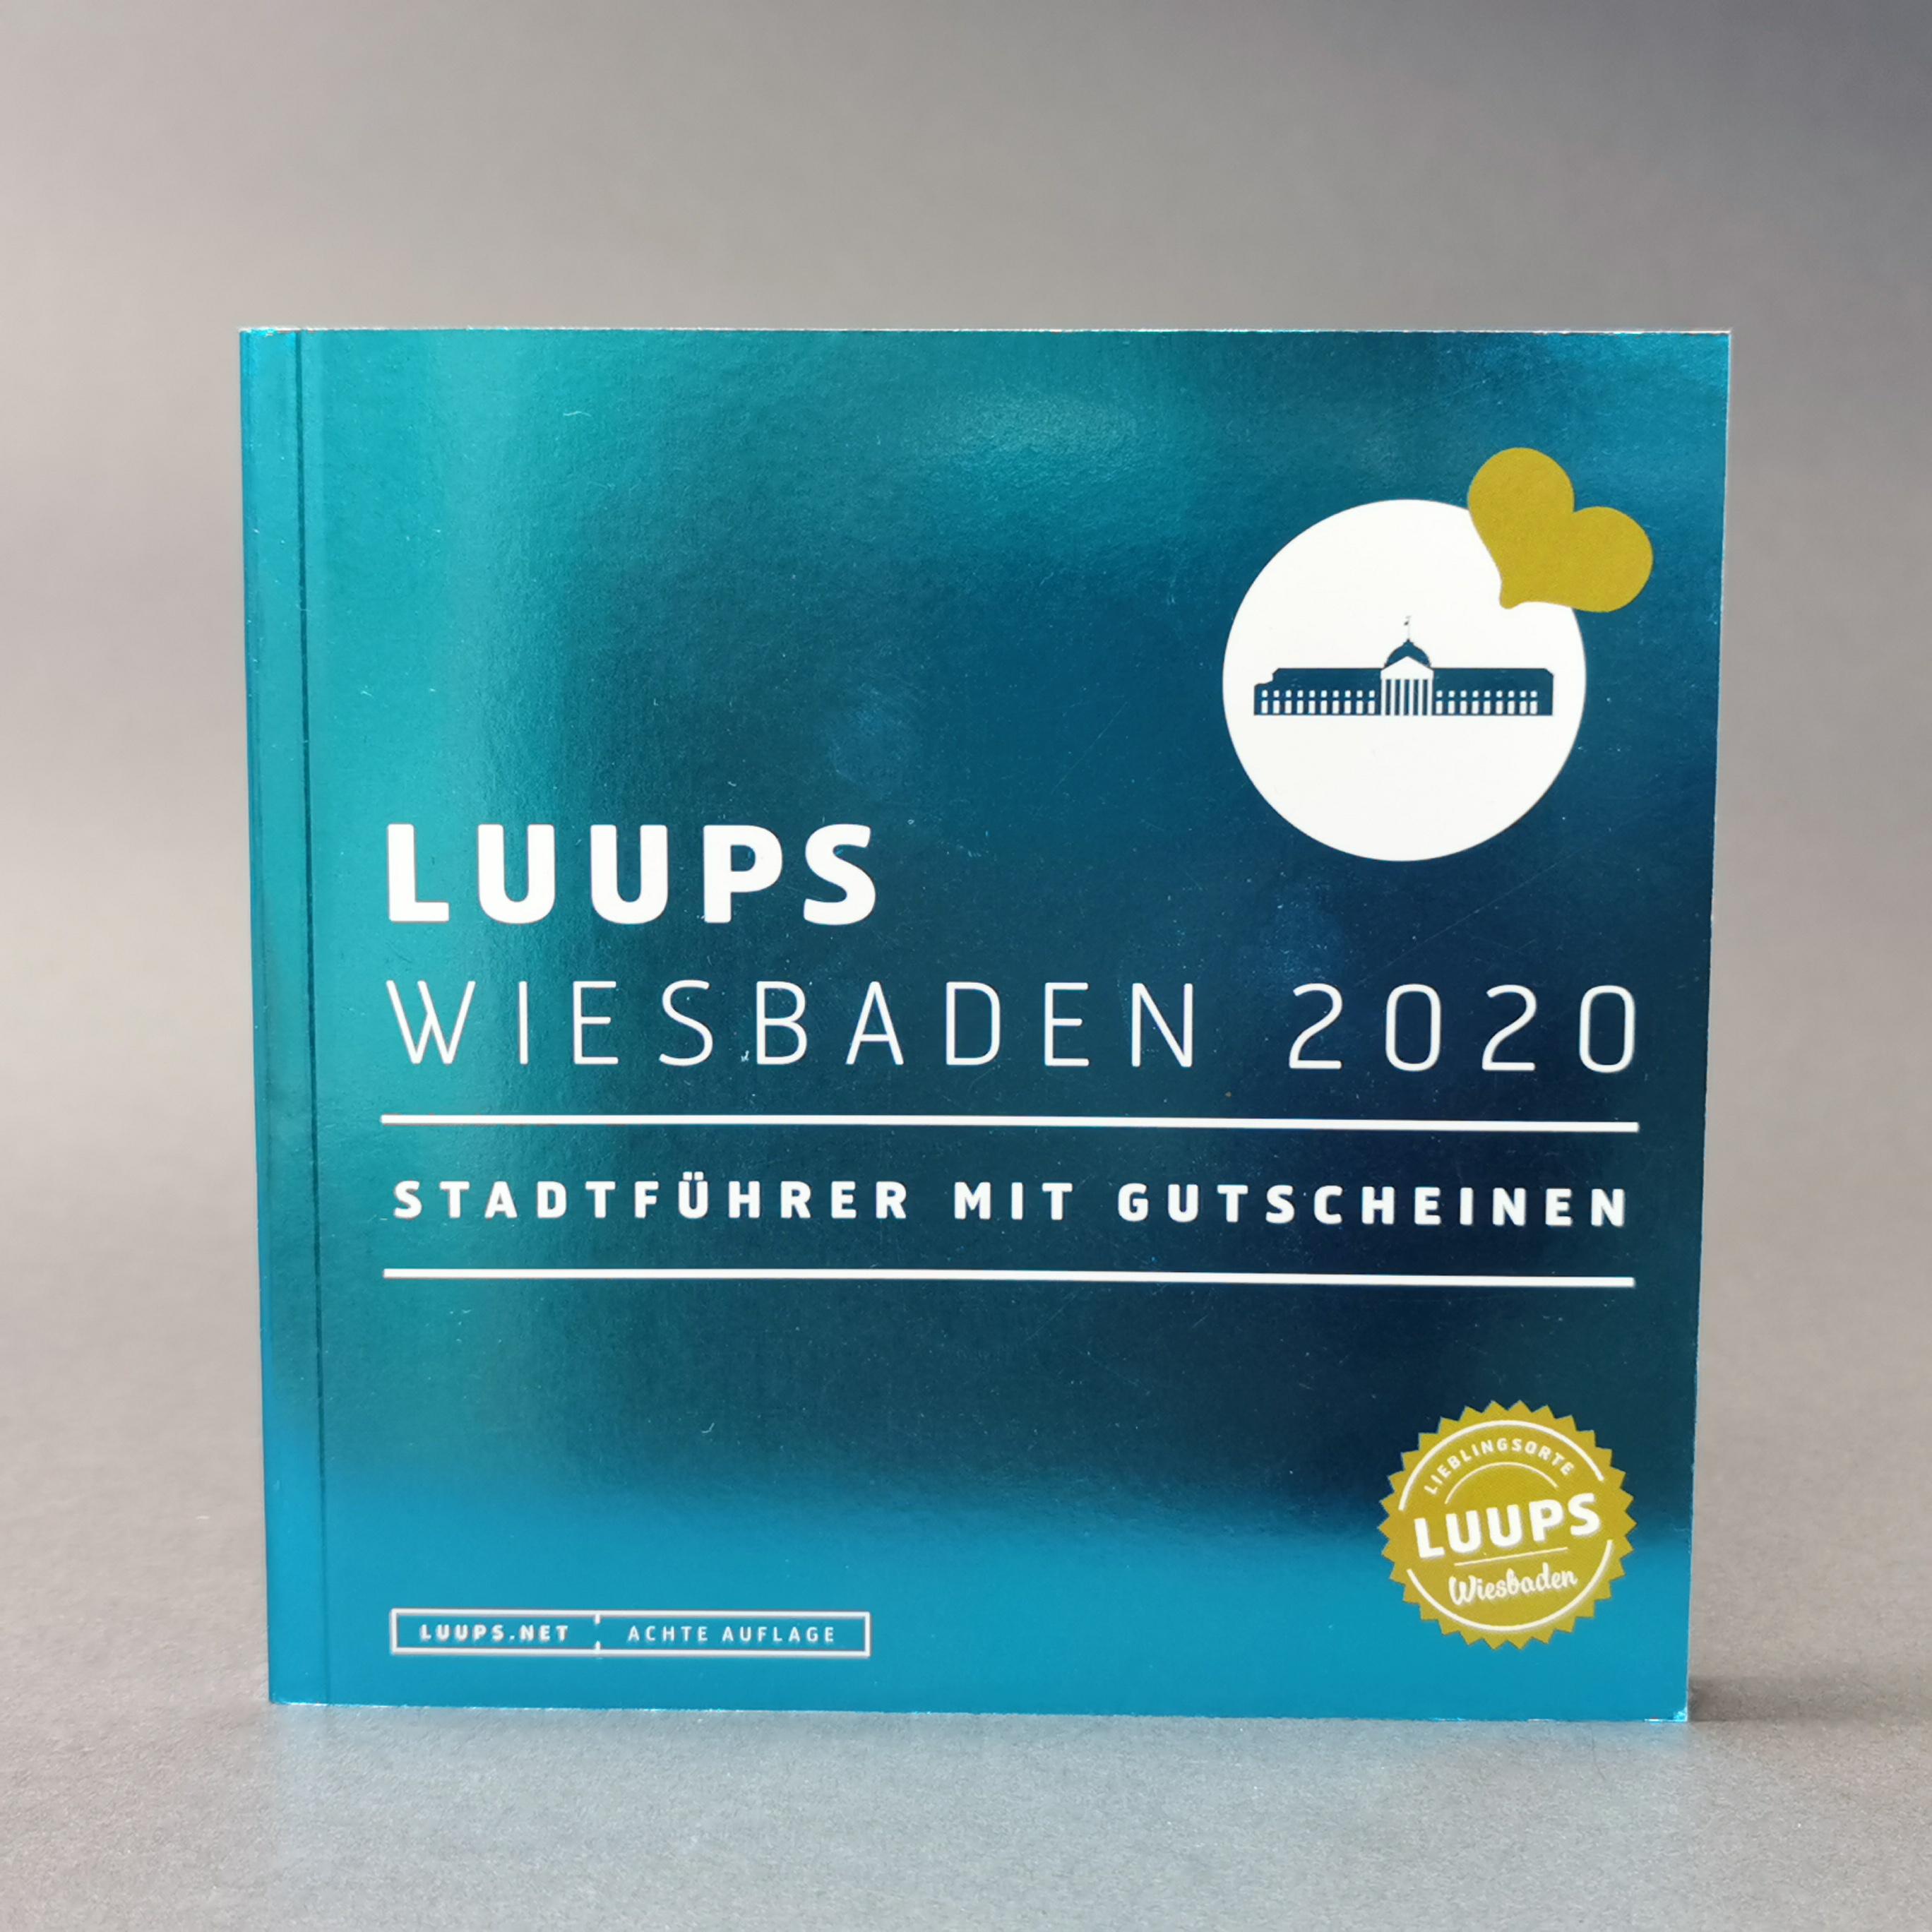 LUUPS 2020